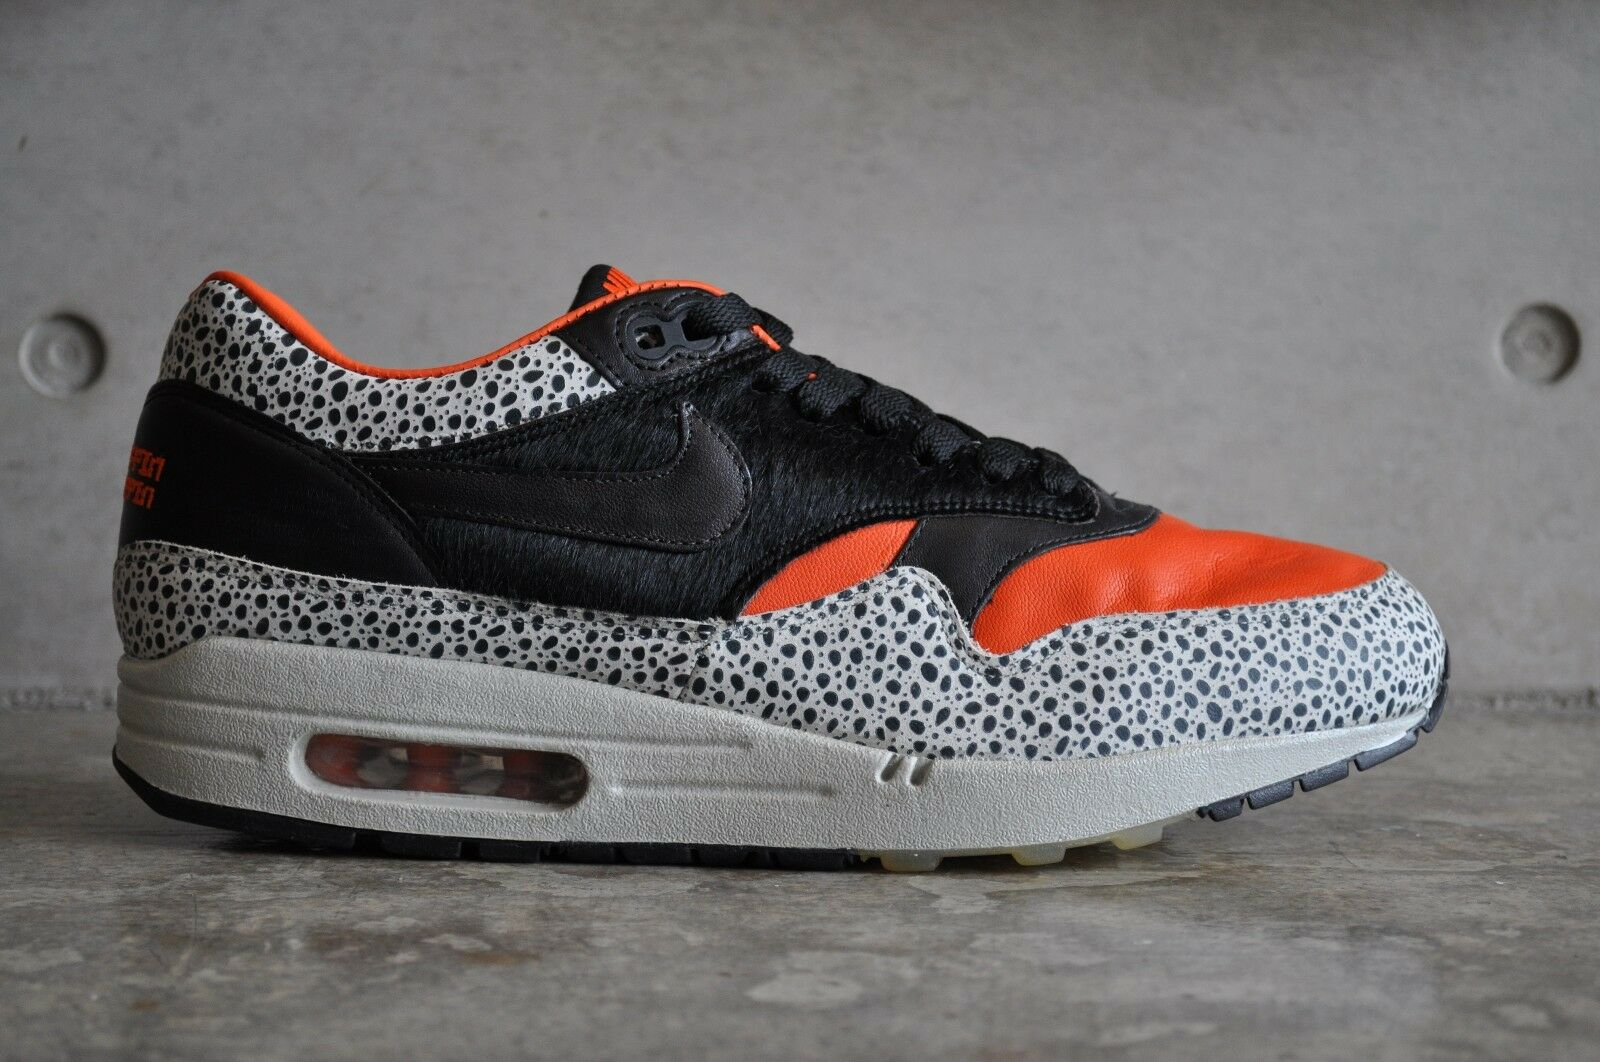 Max 1 Safari Supreme QK Nike Air Safari 1 2008Saftey Naranja/Negro Odd par 7 8 Reino Unido 863064